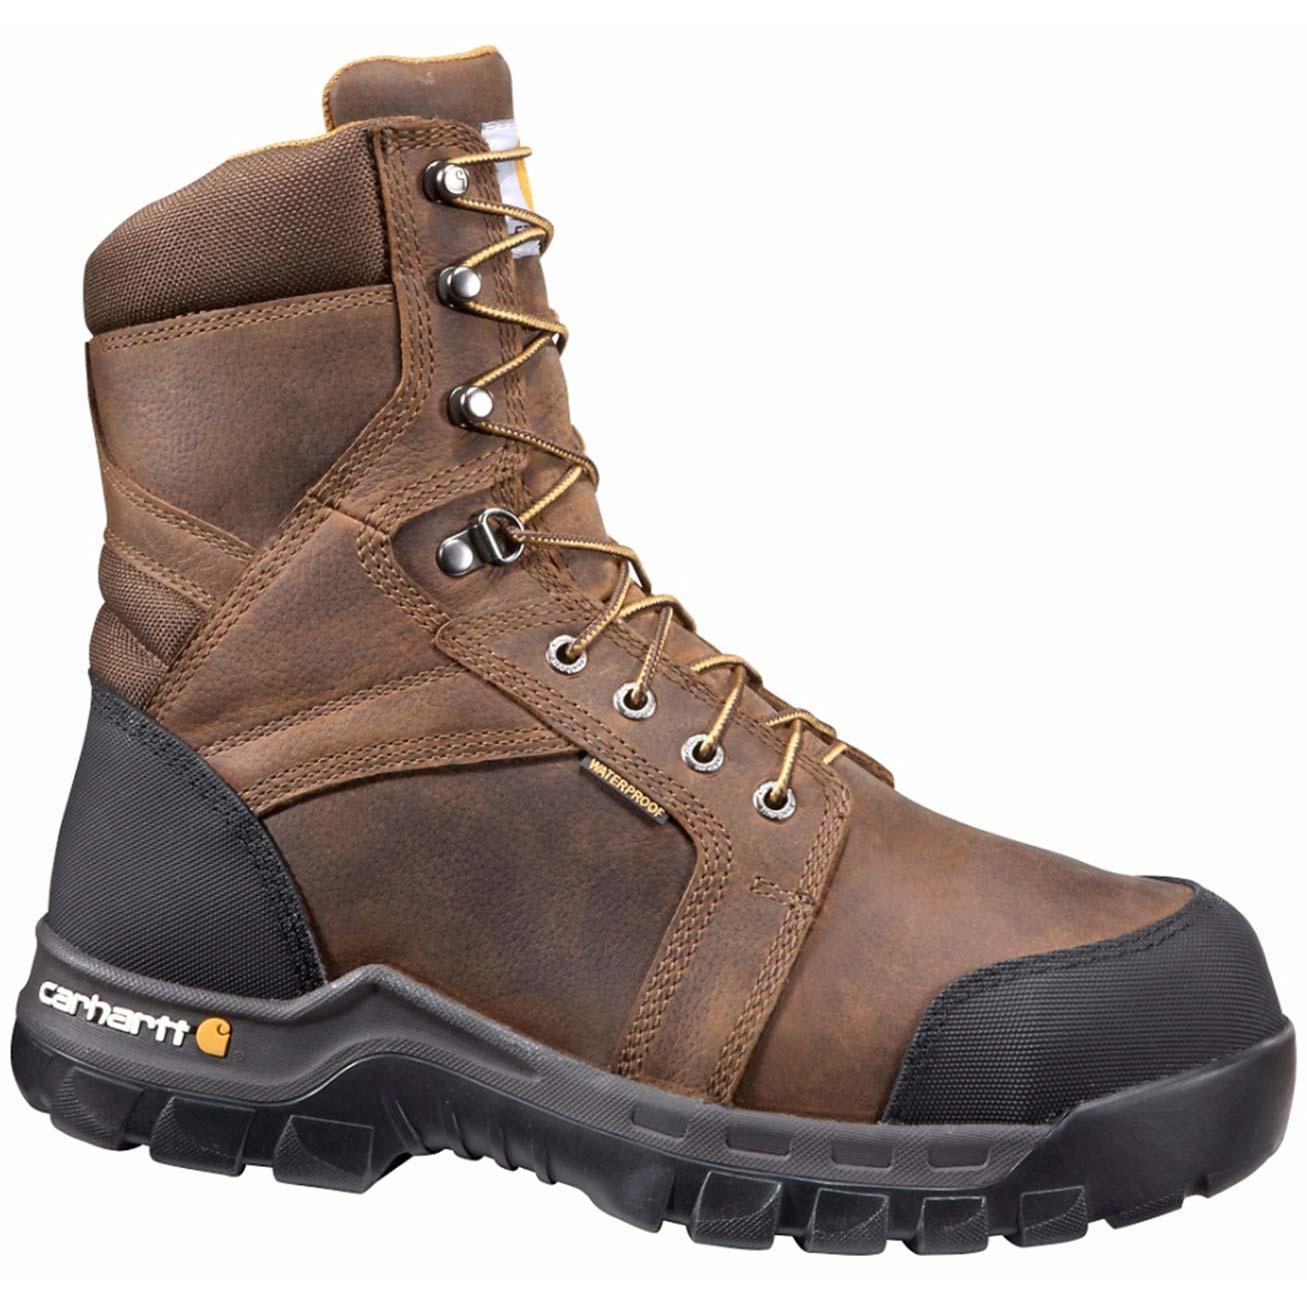 45557e01fb1 Carhartt Composite Toe Internal Met Guard Waterproof Work Hiker